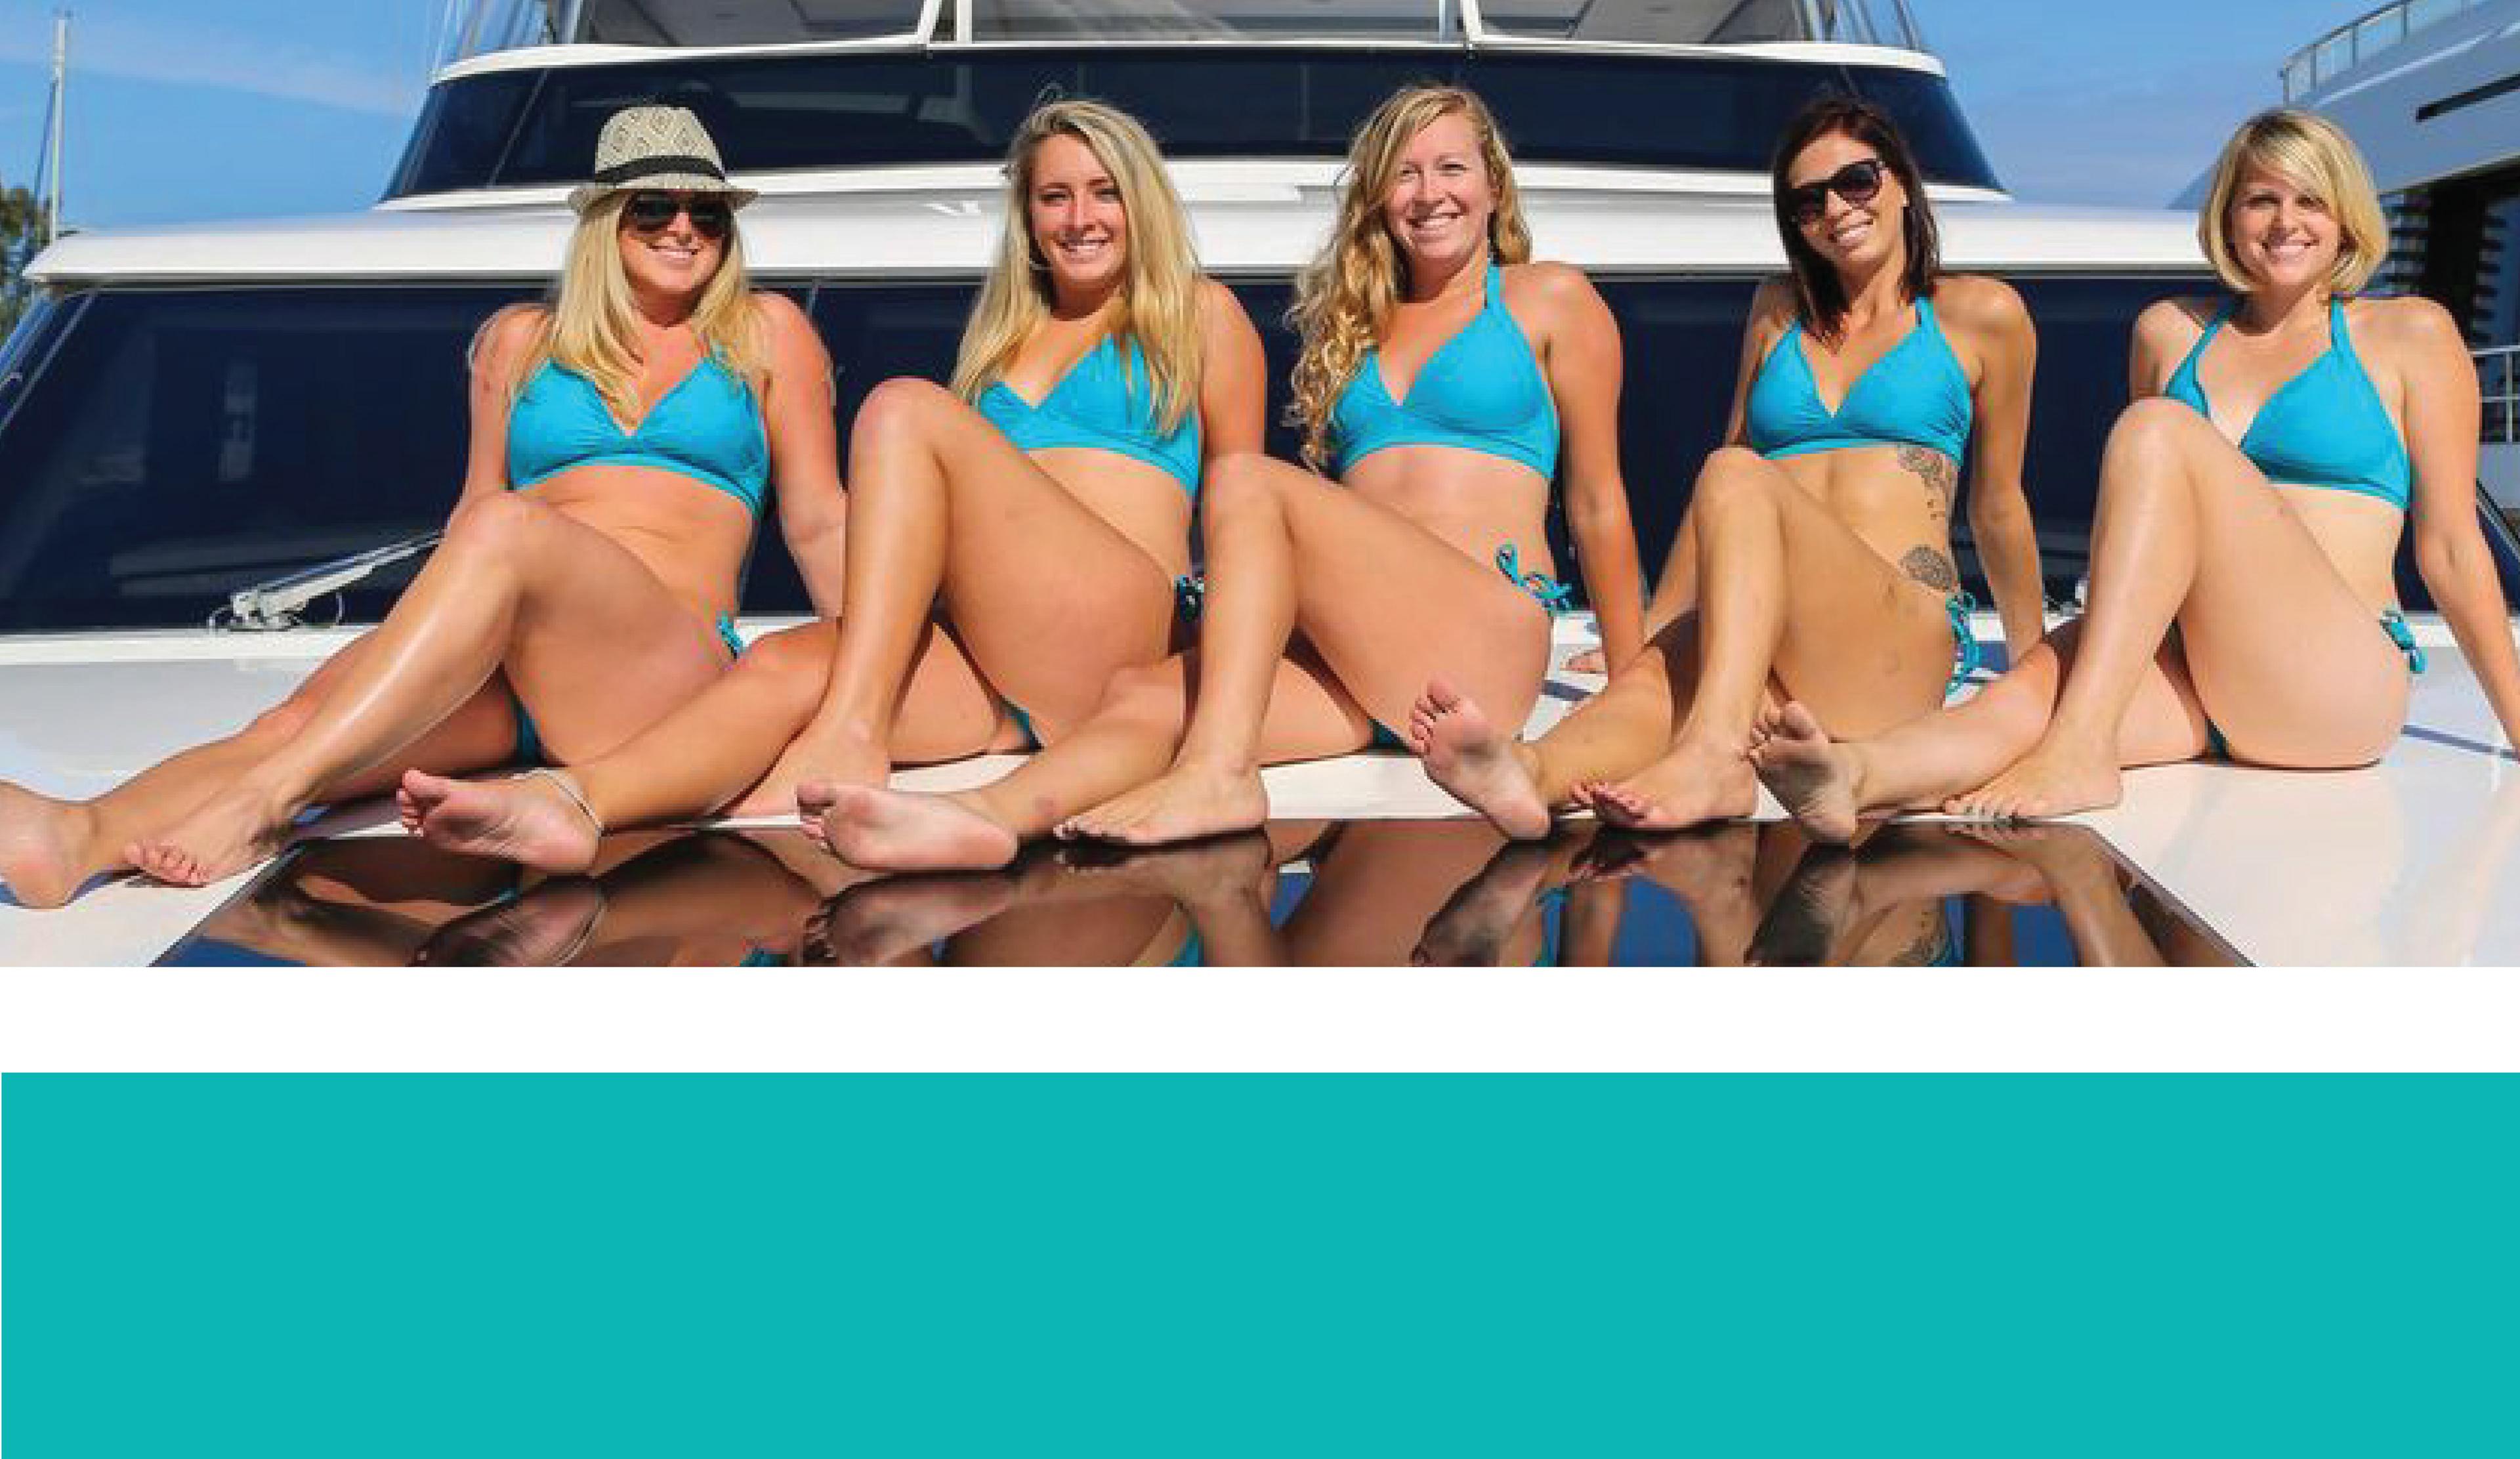 Bikini boat wash, marvel heroes naked sex